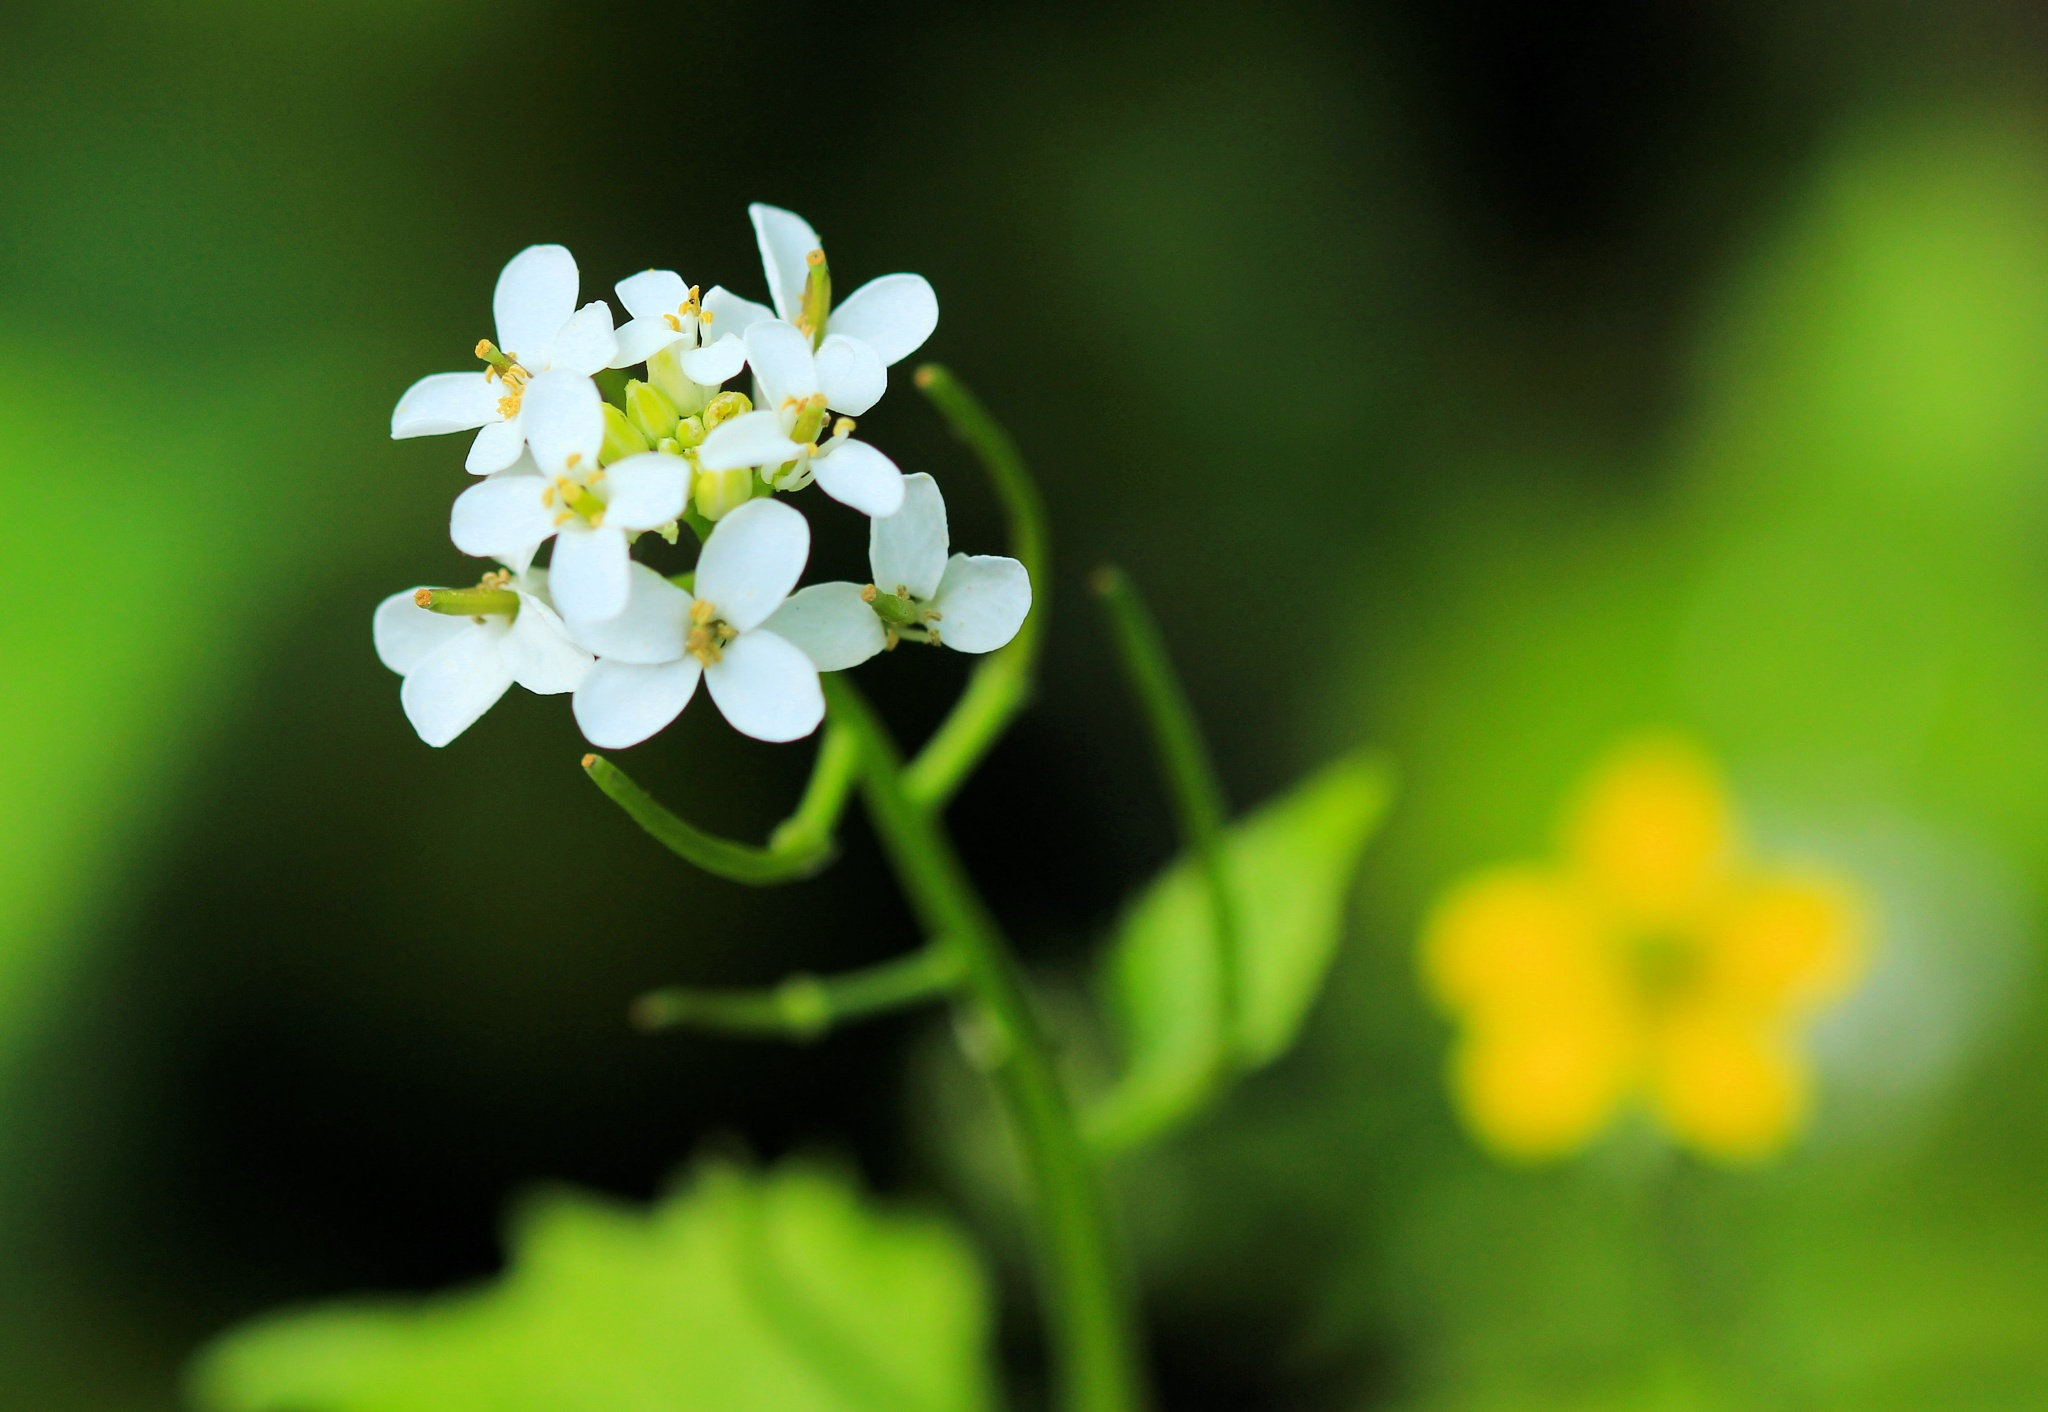 White Petals by cln.wvr